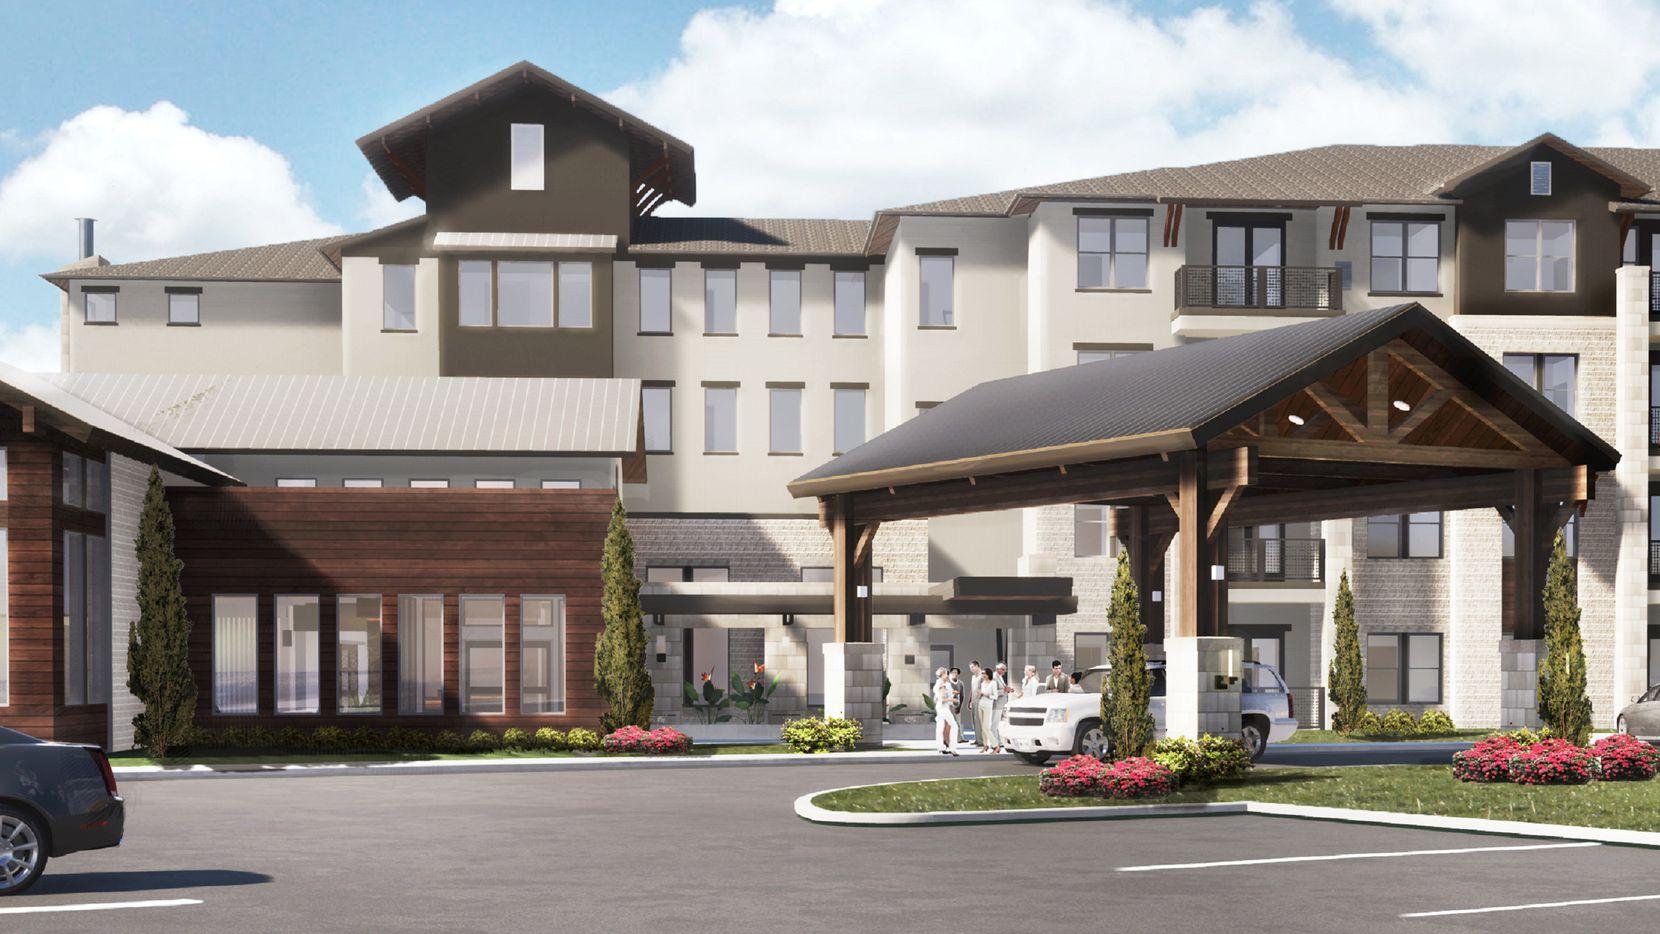 The Hidden Springs community will open in 2019.